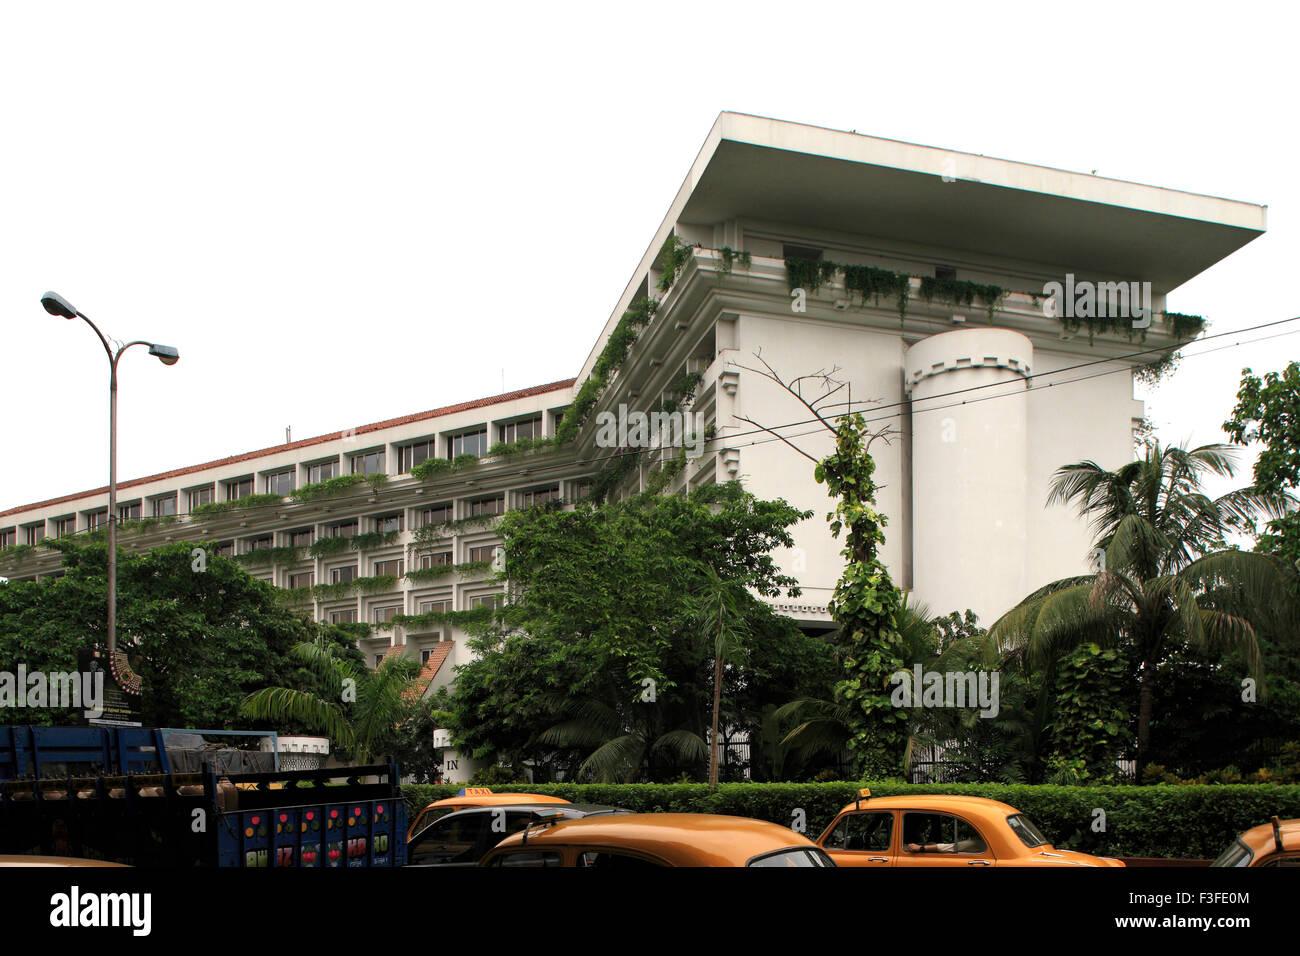 Taj bengal 5 star hotel ; Calcutta ; West Bengal ; India - Stock Image